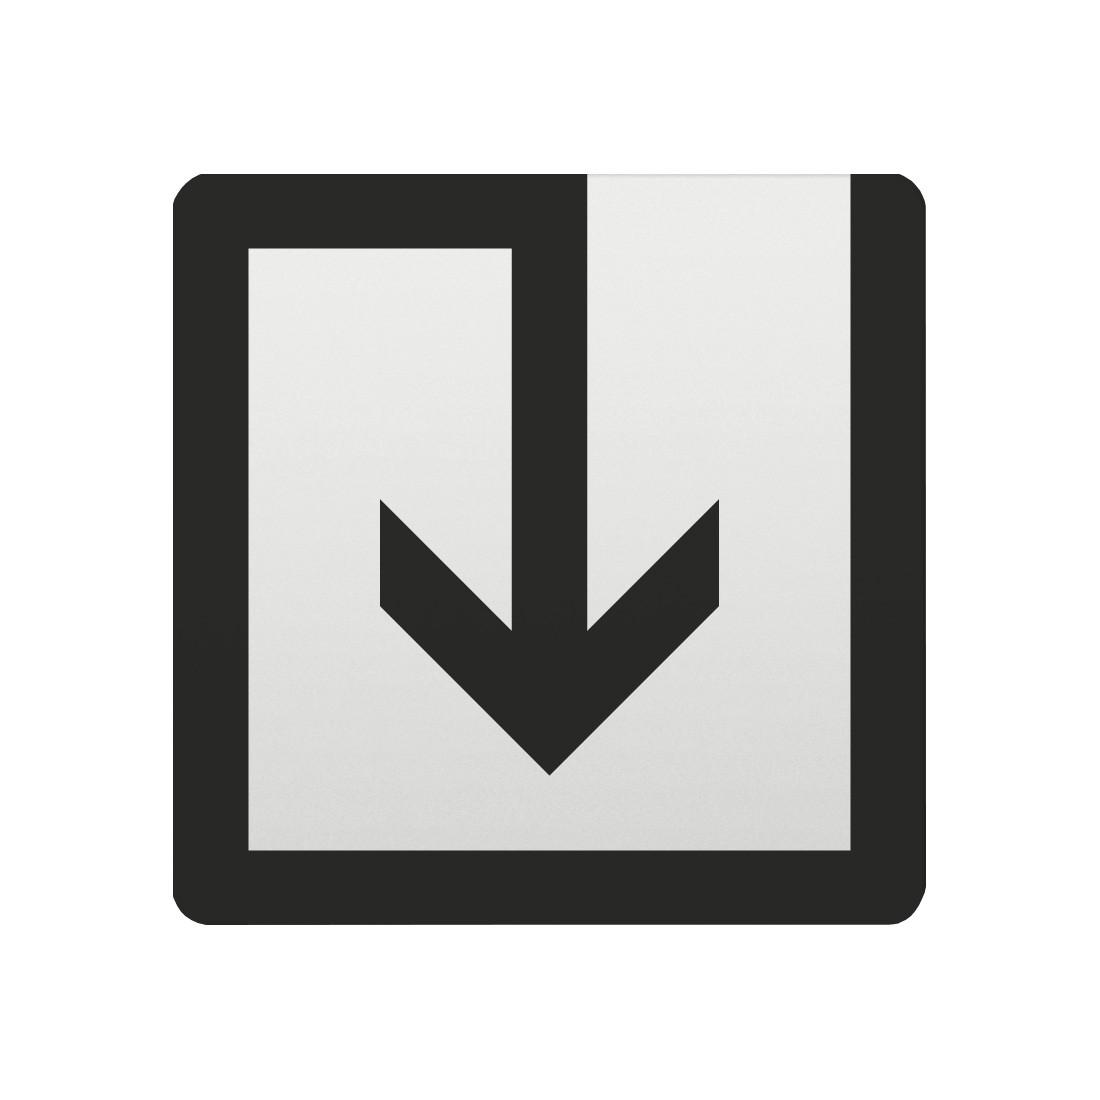 FSB Hinweiszeichen Abfall Lasergraviert Aluminium naturfarbig (0 36 4059 00040 0105)